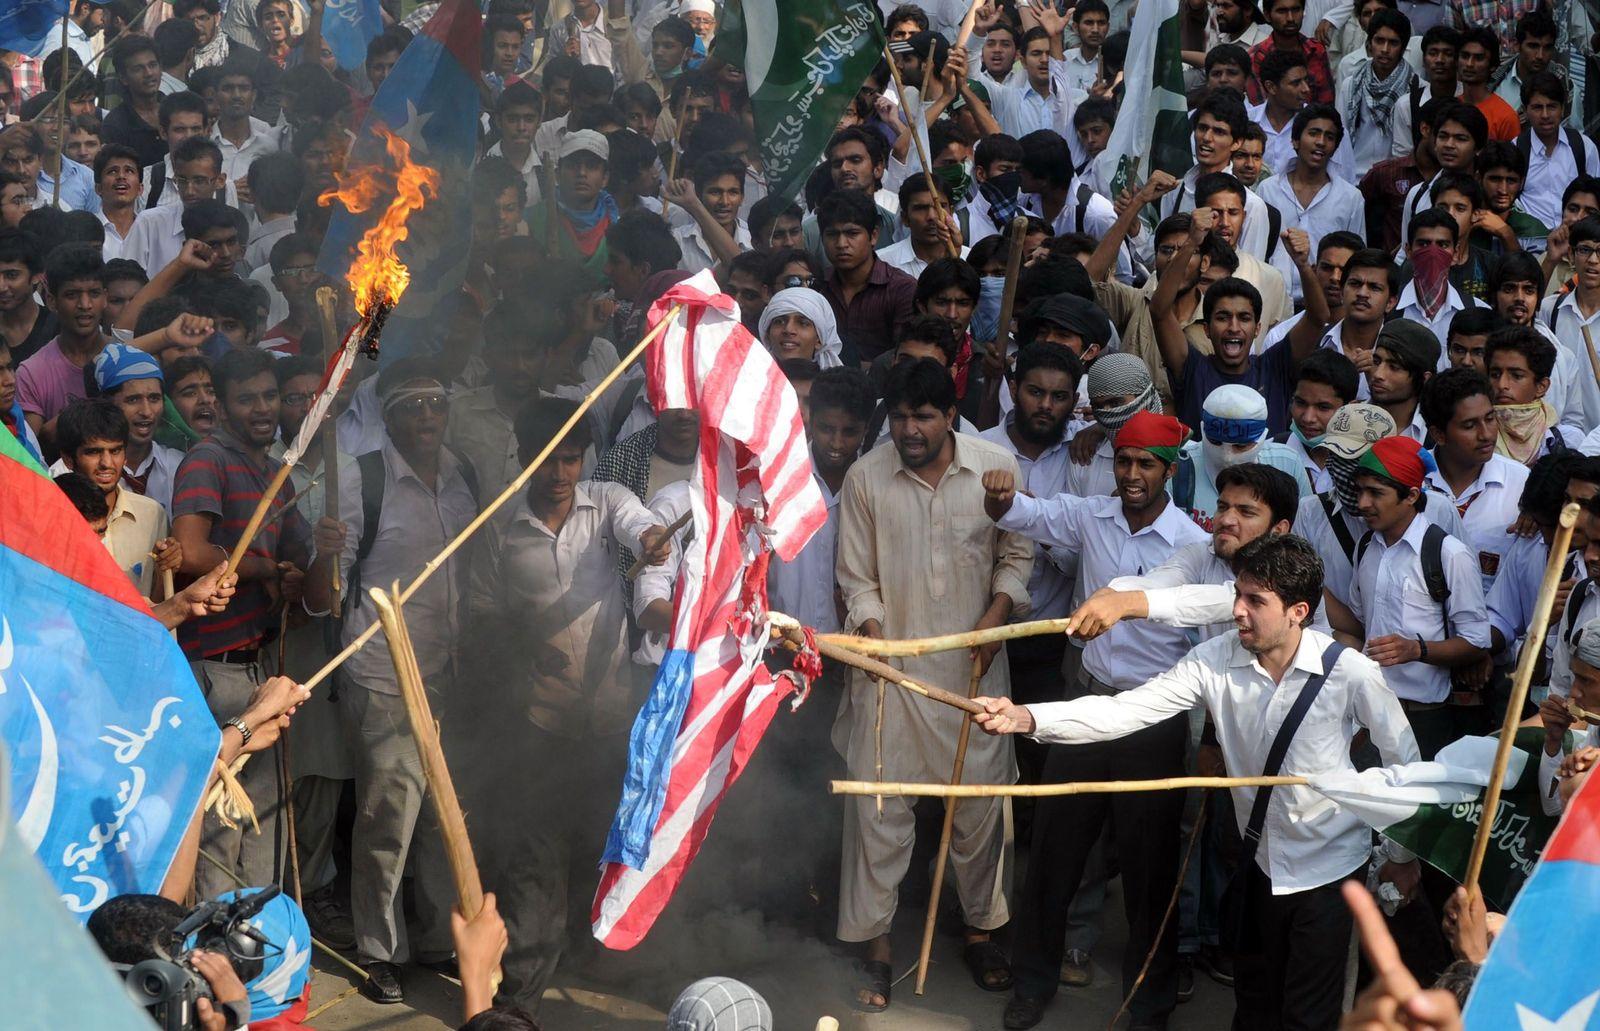 pakistan flagge brennt